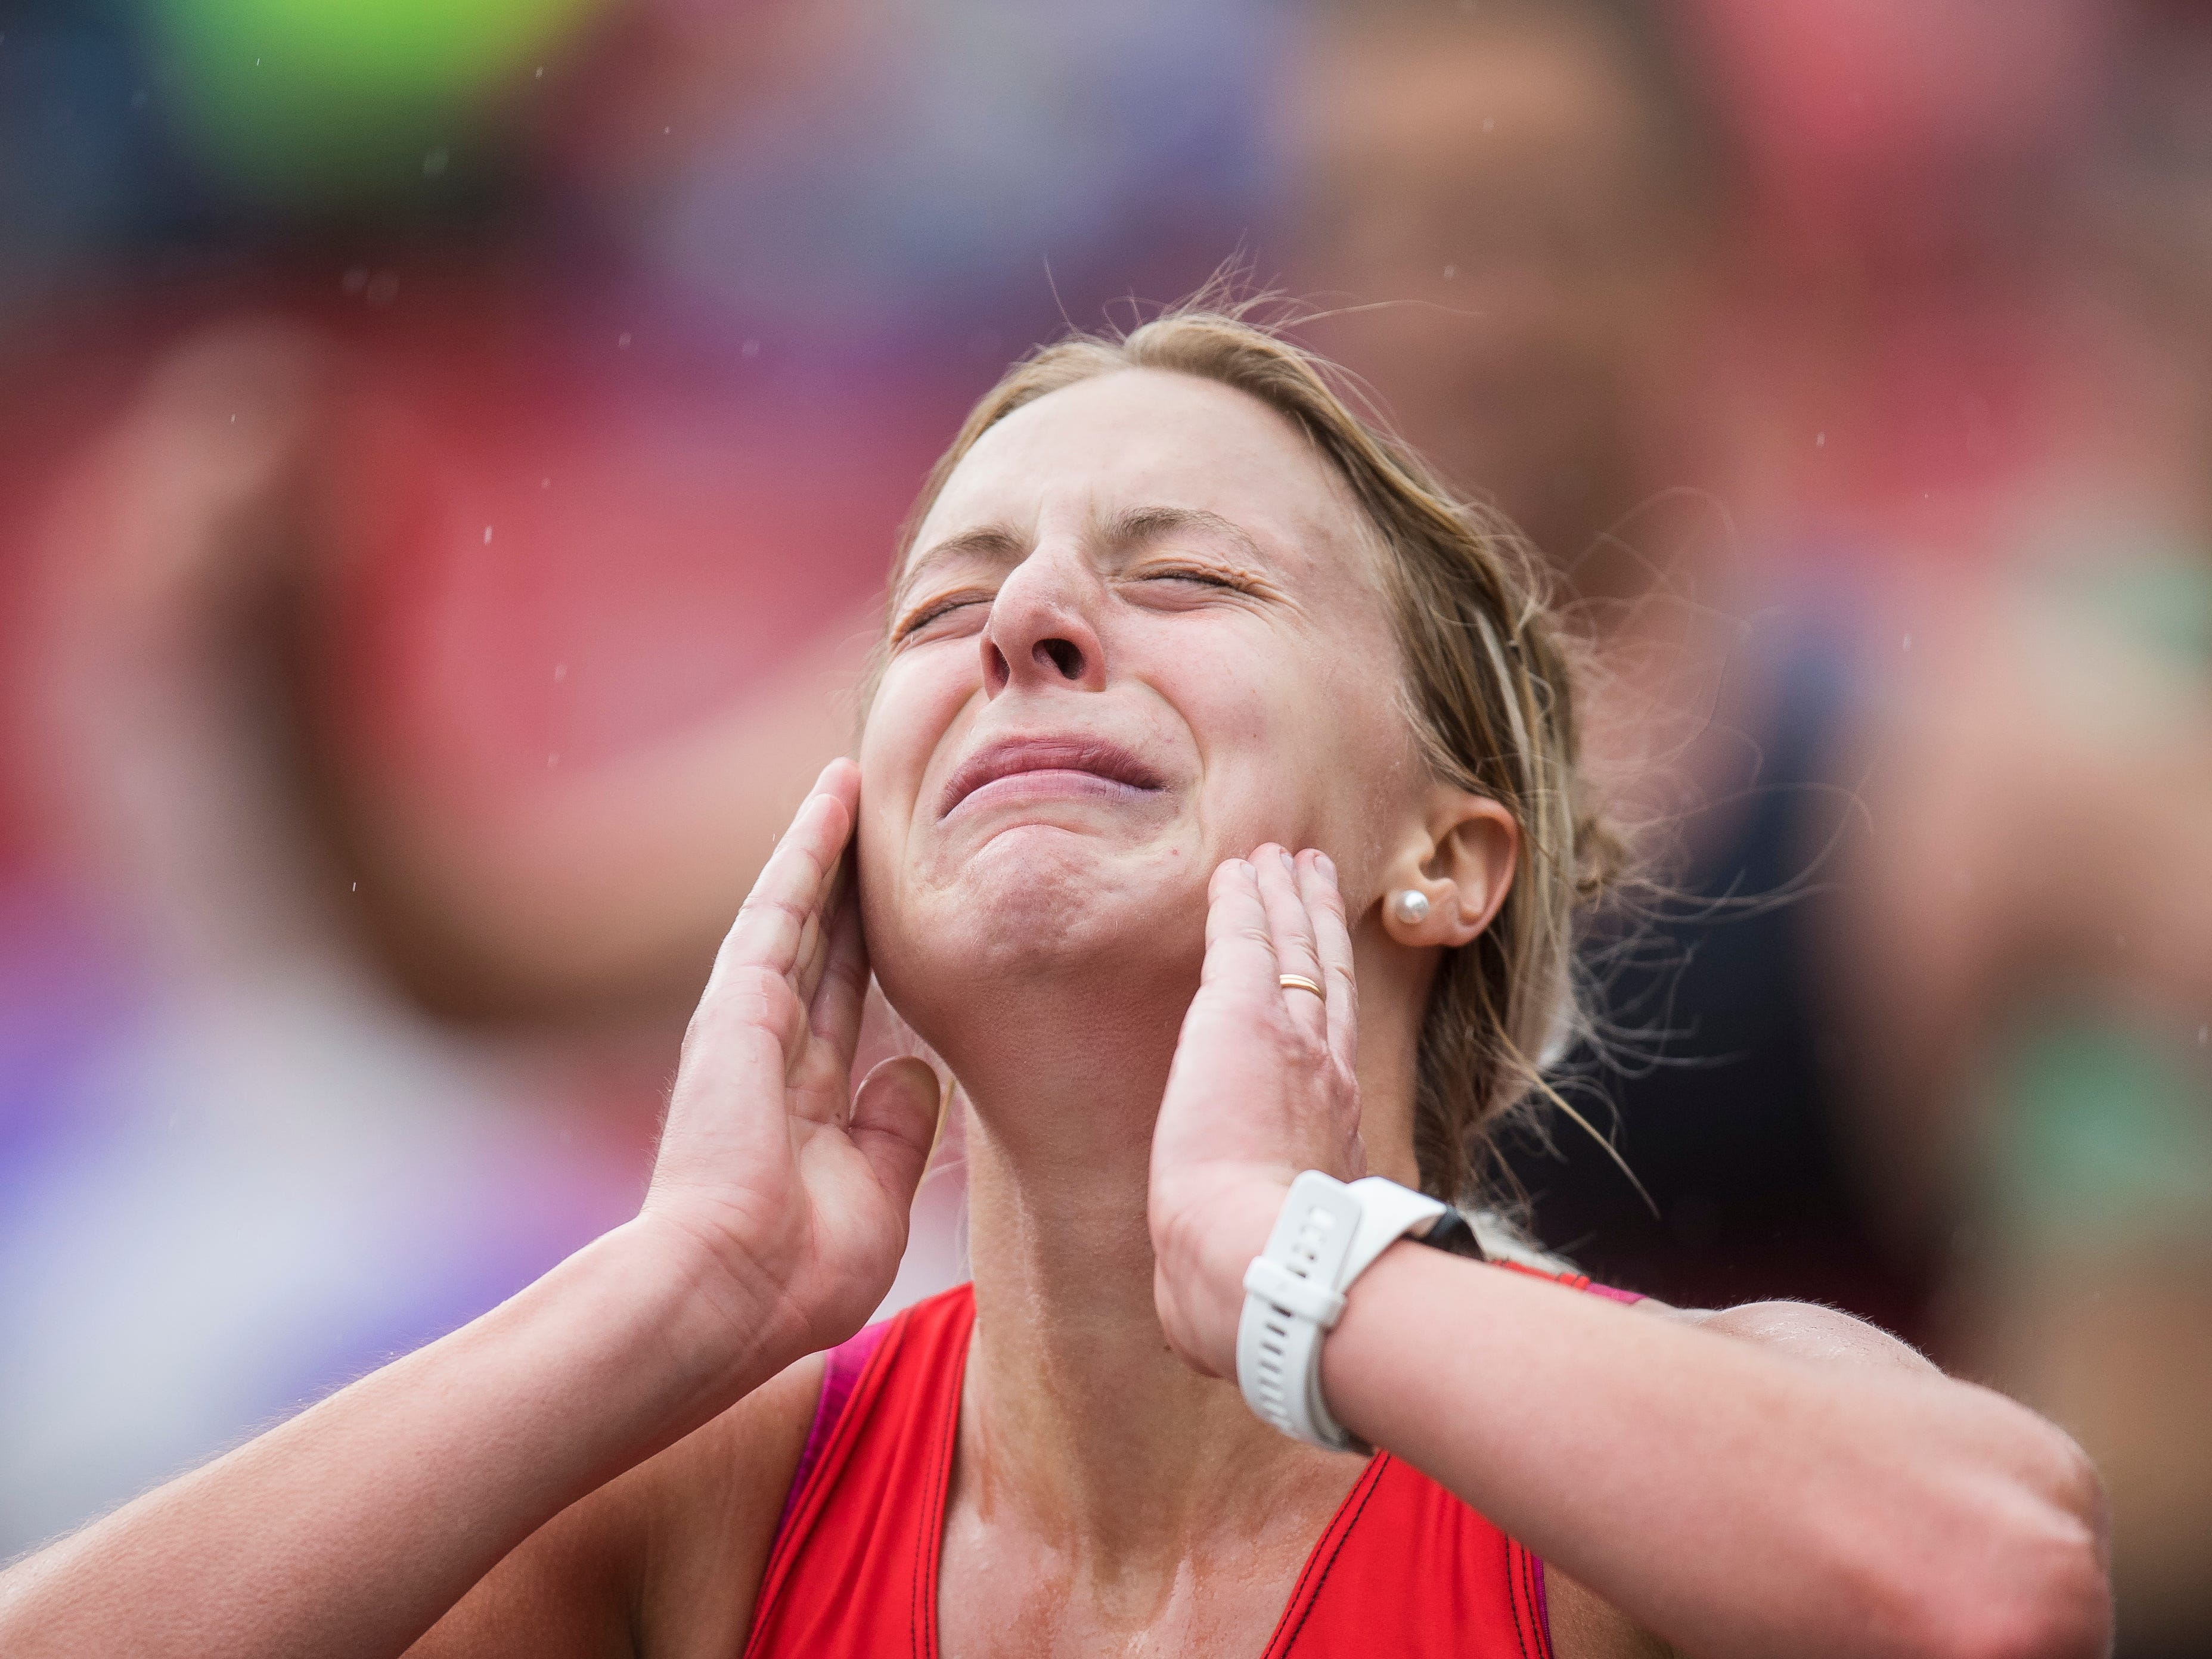 Madeleine Reber finishes the St. George Marathon Saturday, October 6, 2018.